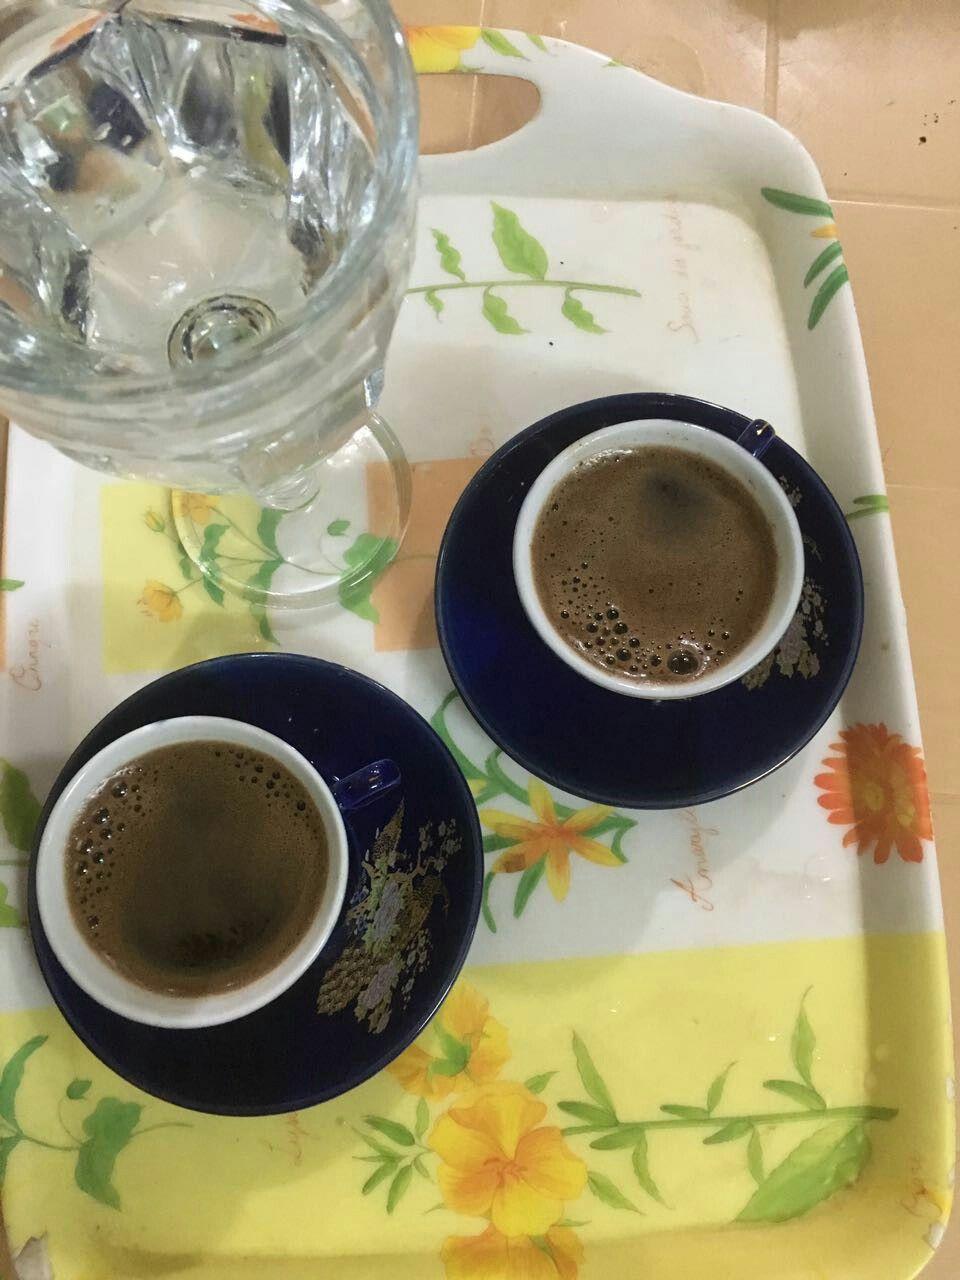 فنجان قهوتي Tableware Glassware Kitchen